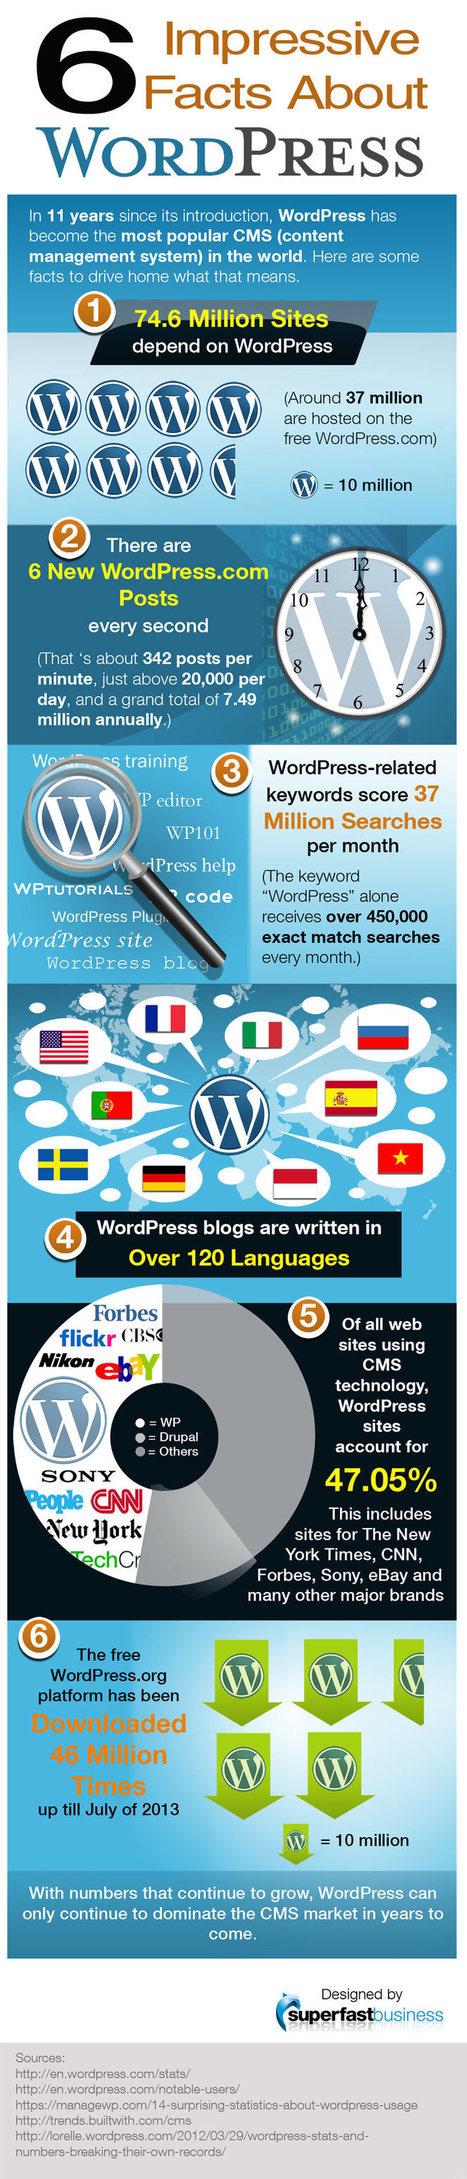 6 impressive facts about WordPress CMS Weblog | Marketing in Geneva | Scoop.it